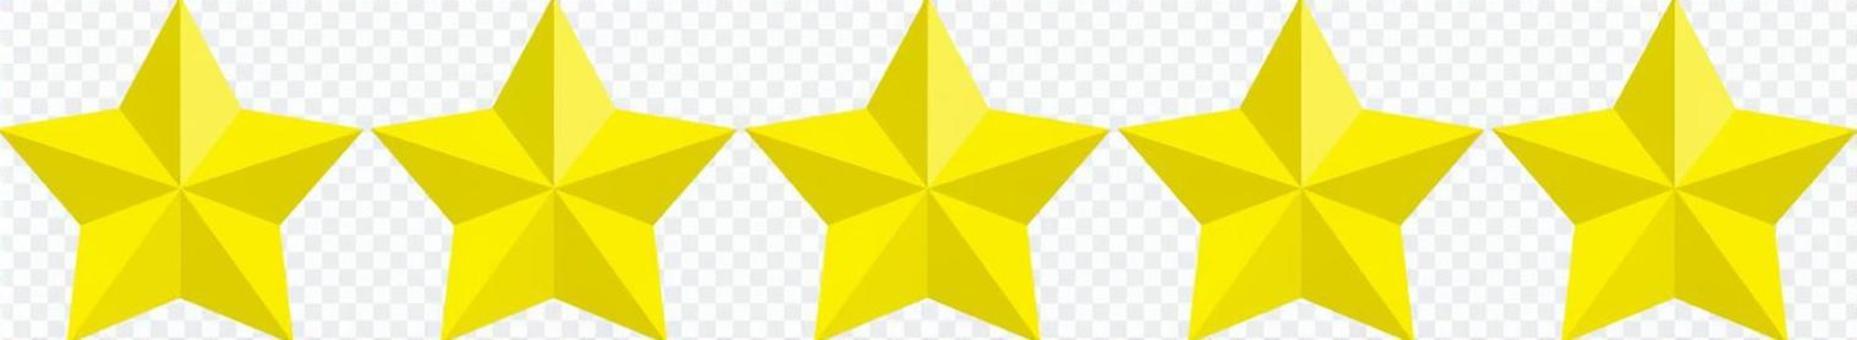 Star 5 icons ★ 3D ★ Design Parts